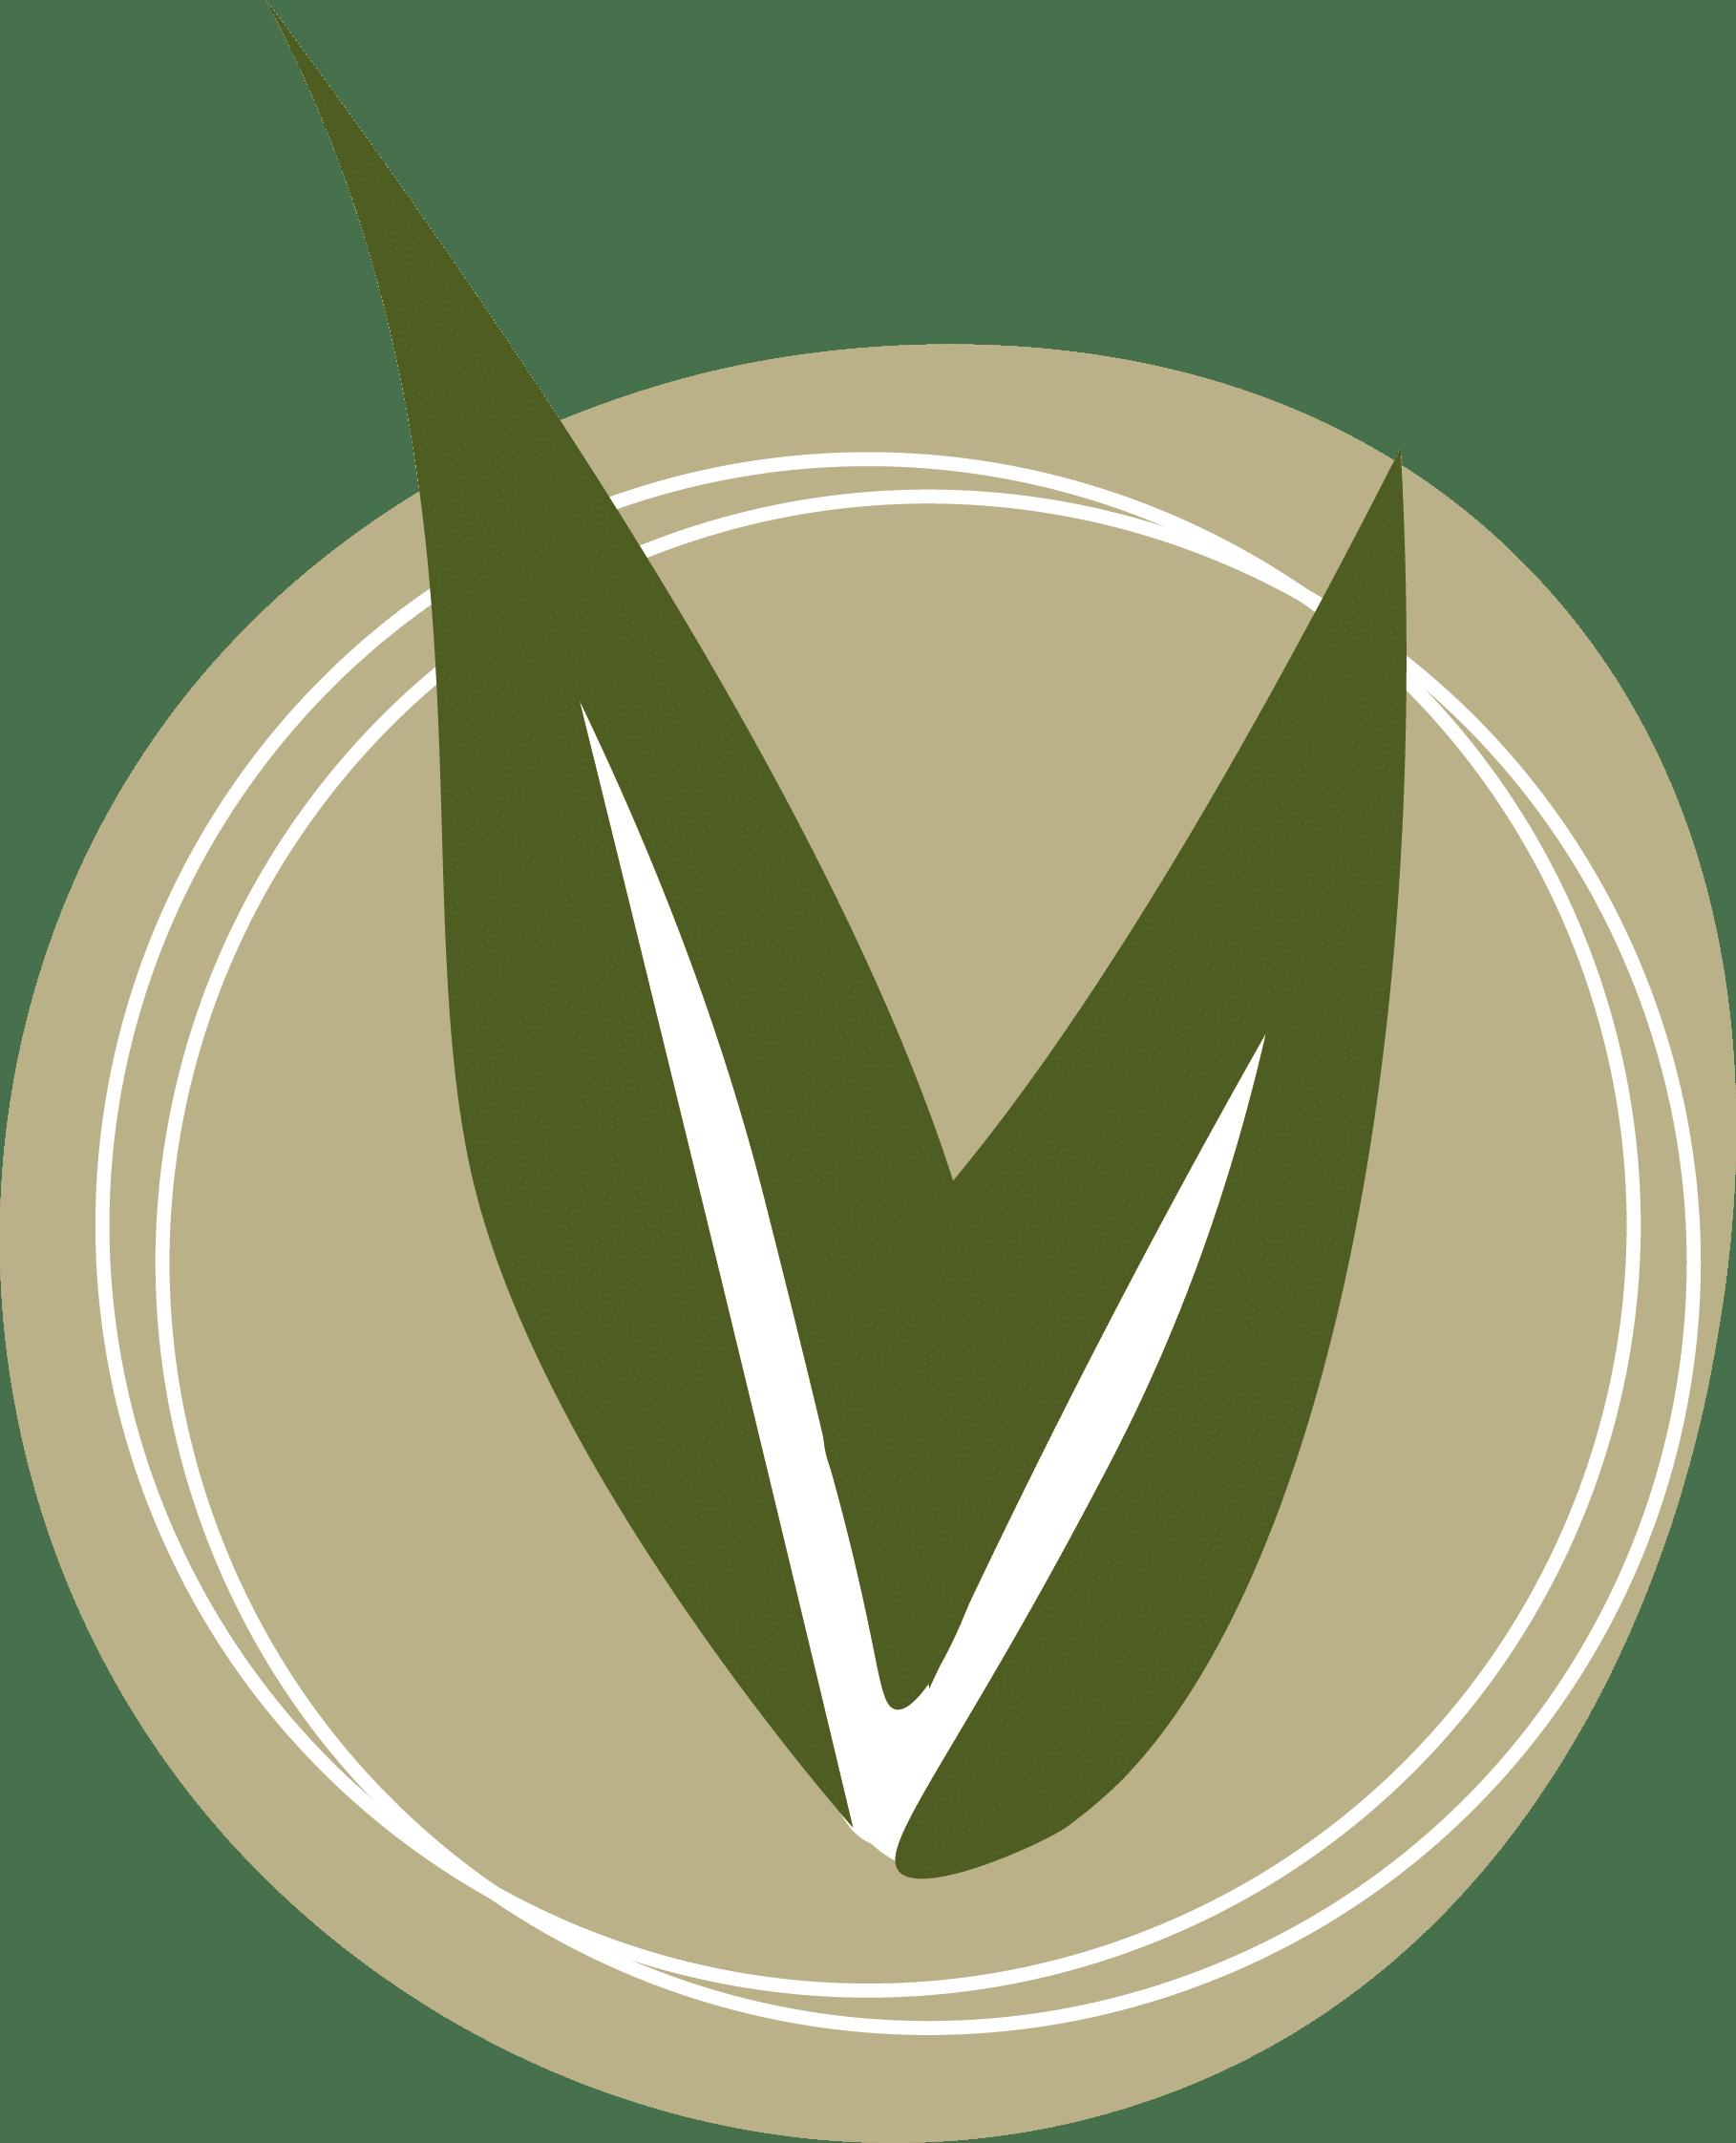 Vesund - Gesund vegan